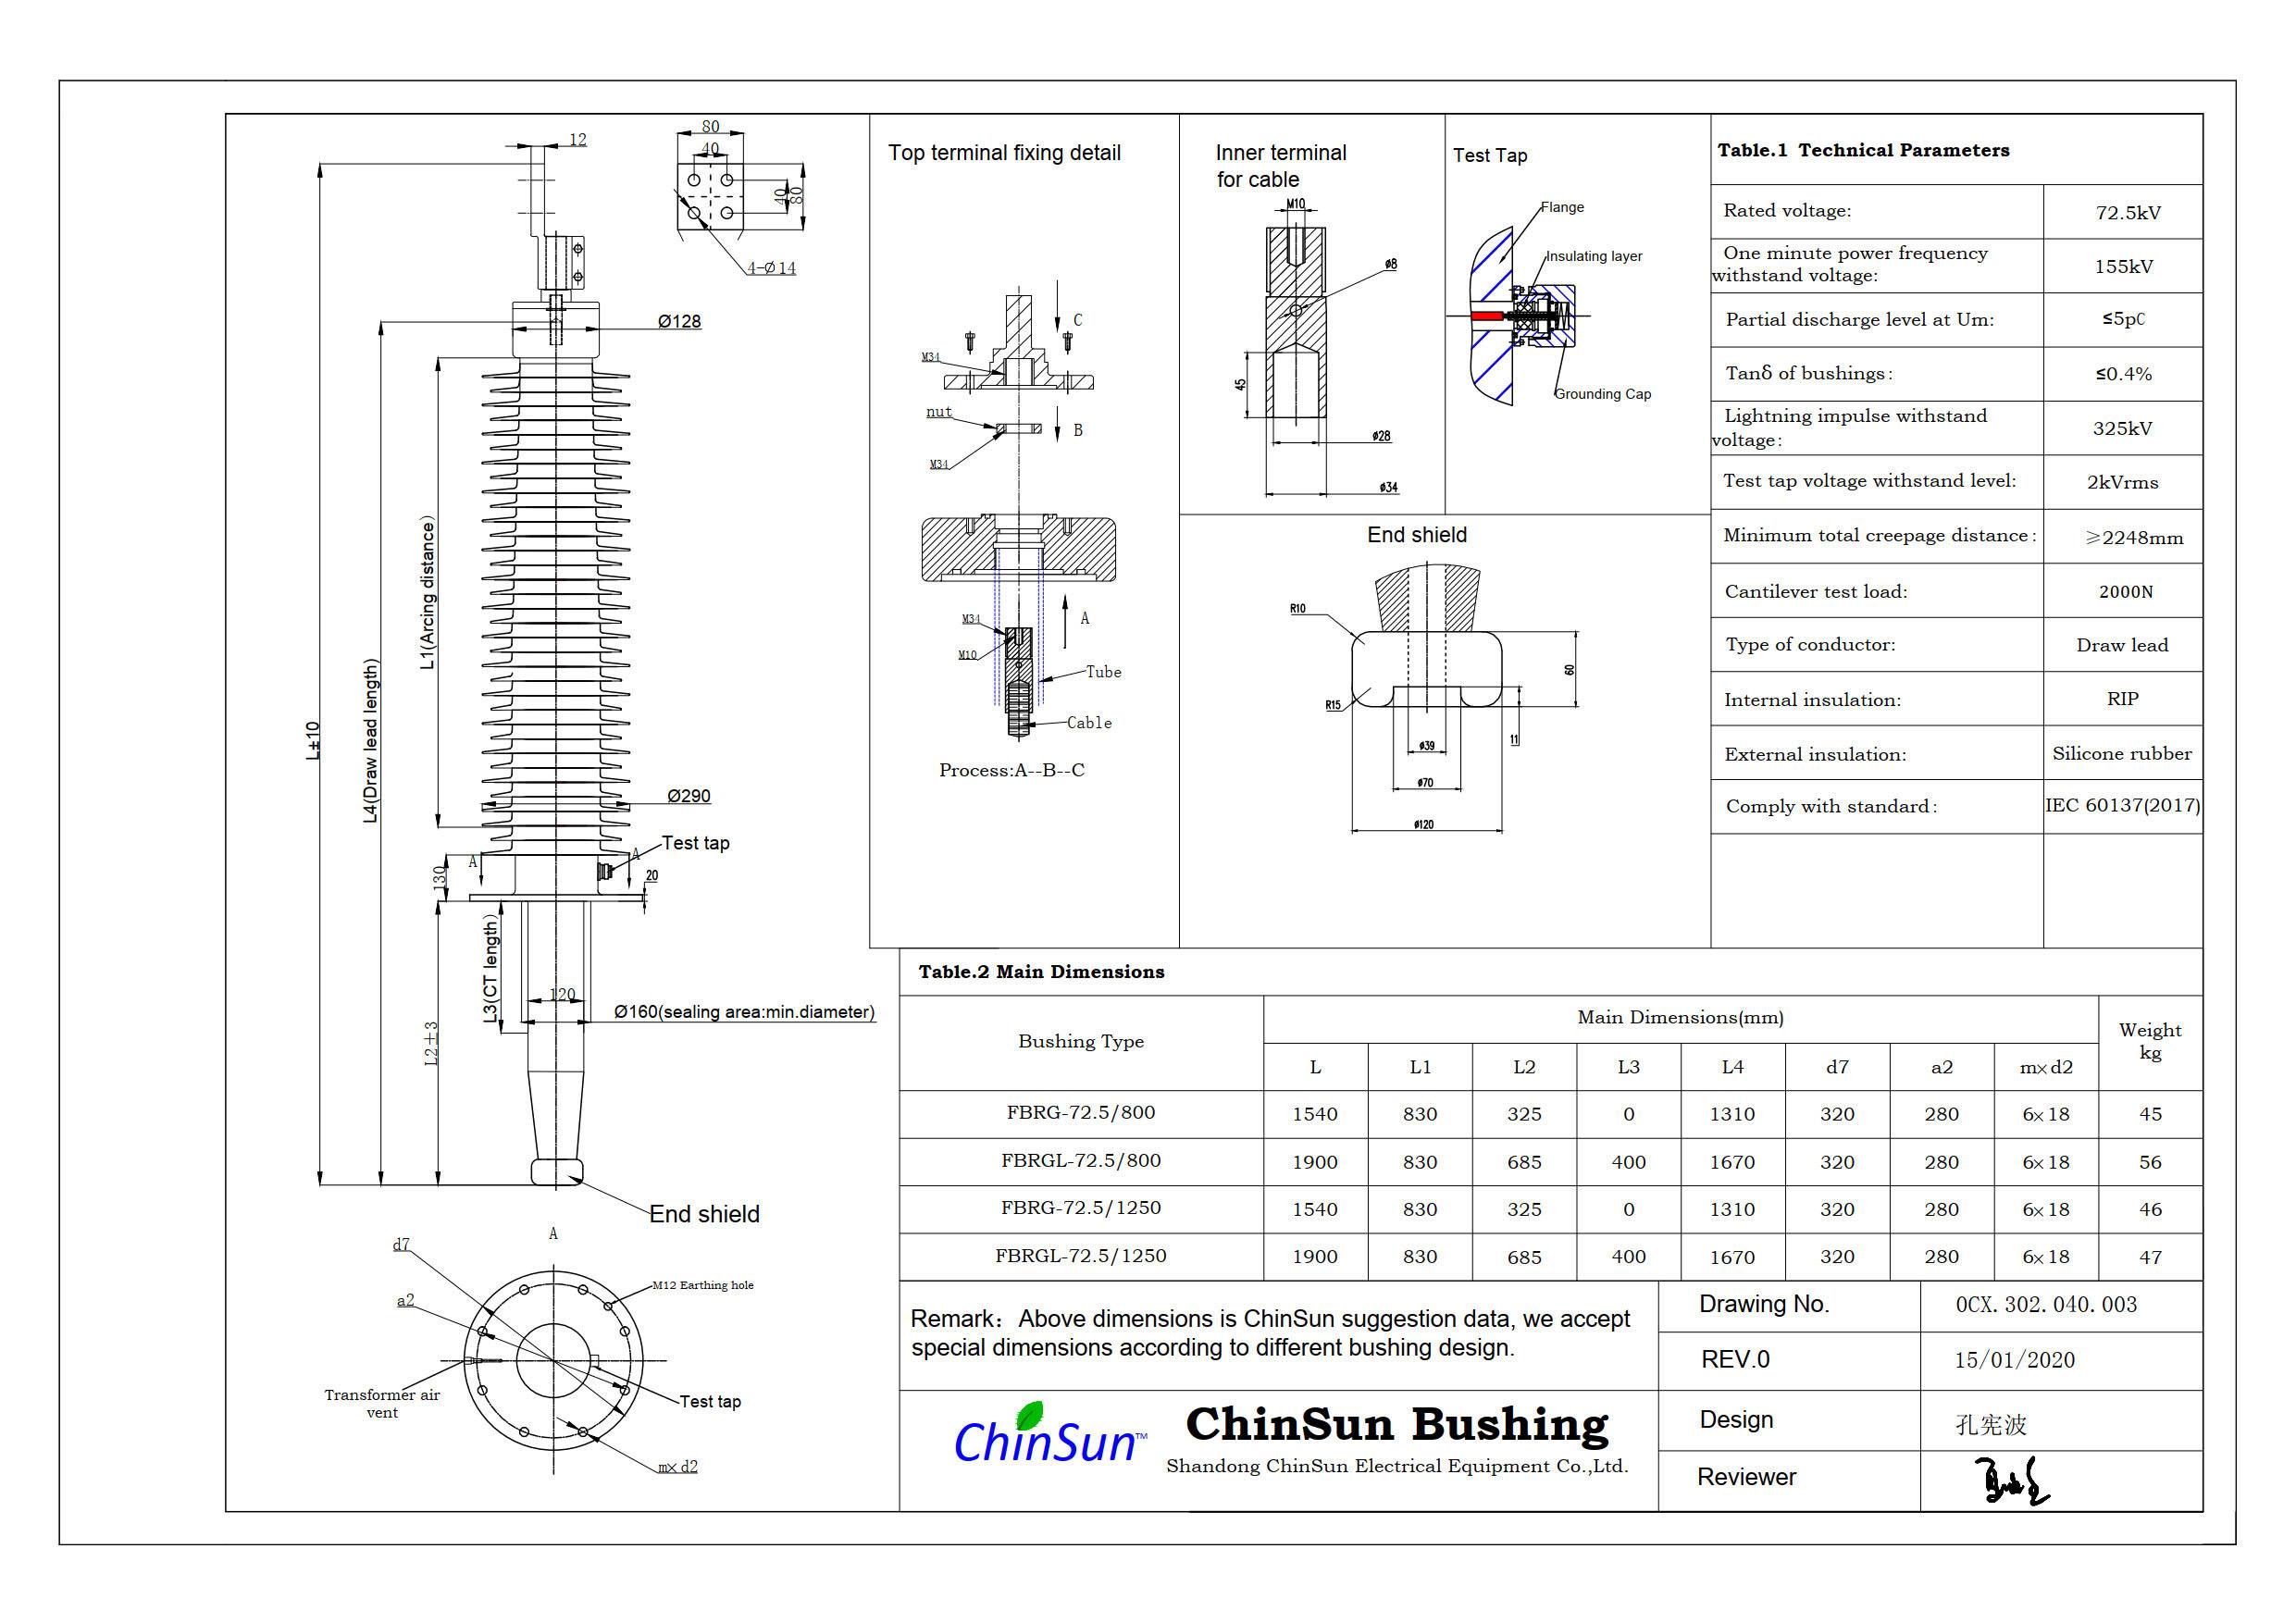 Drawing-transformer bushing-72.5kV_silicone rubber-DL-ChinSun